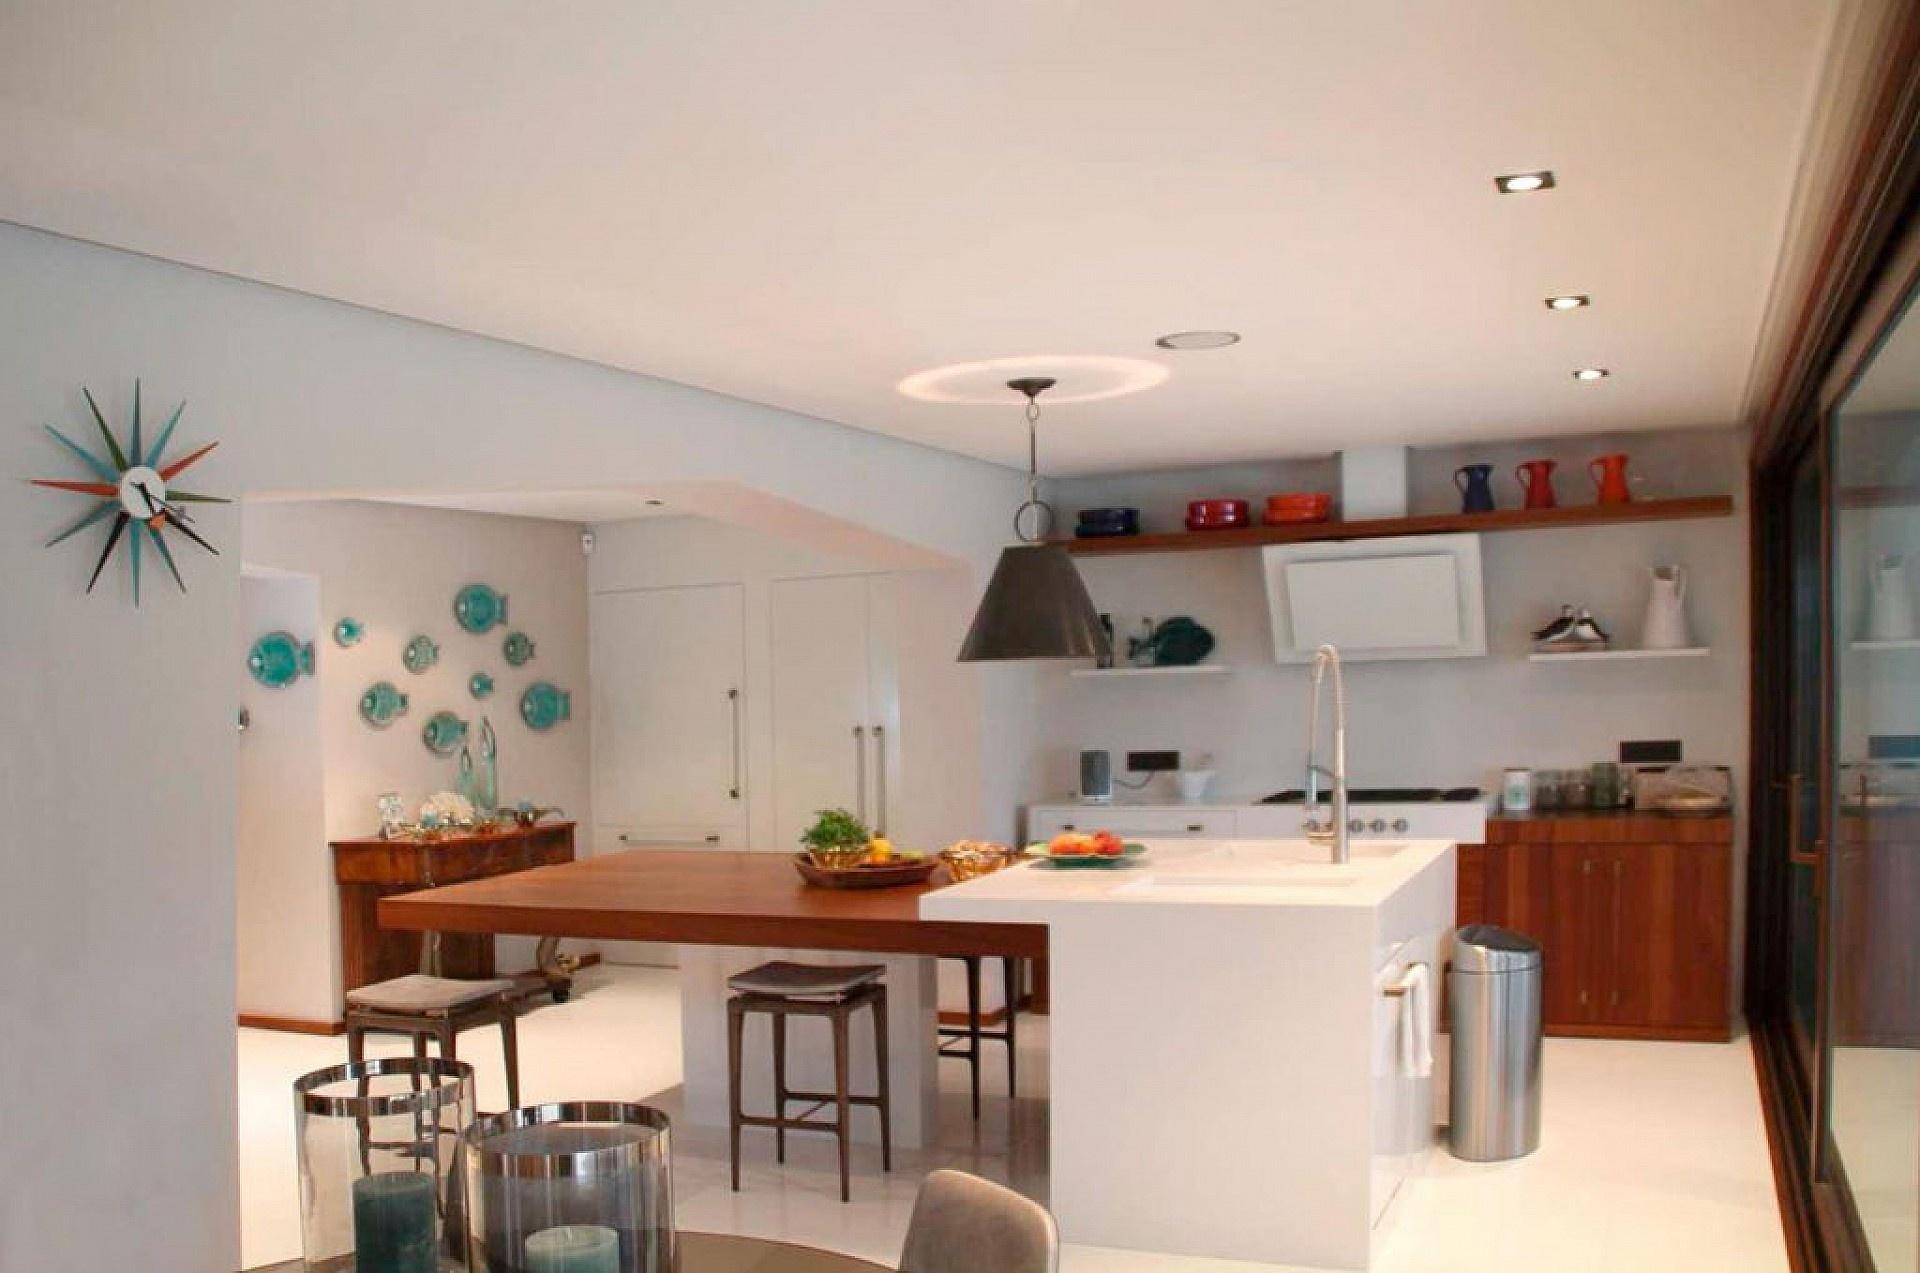 w_denia-huis-tekoop-costa-blanca-spanje-217.jpg